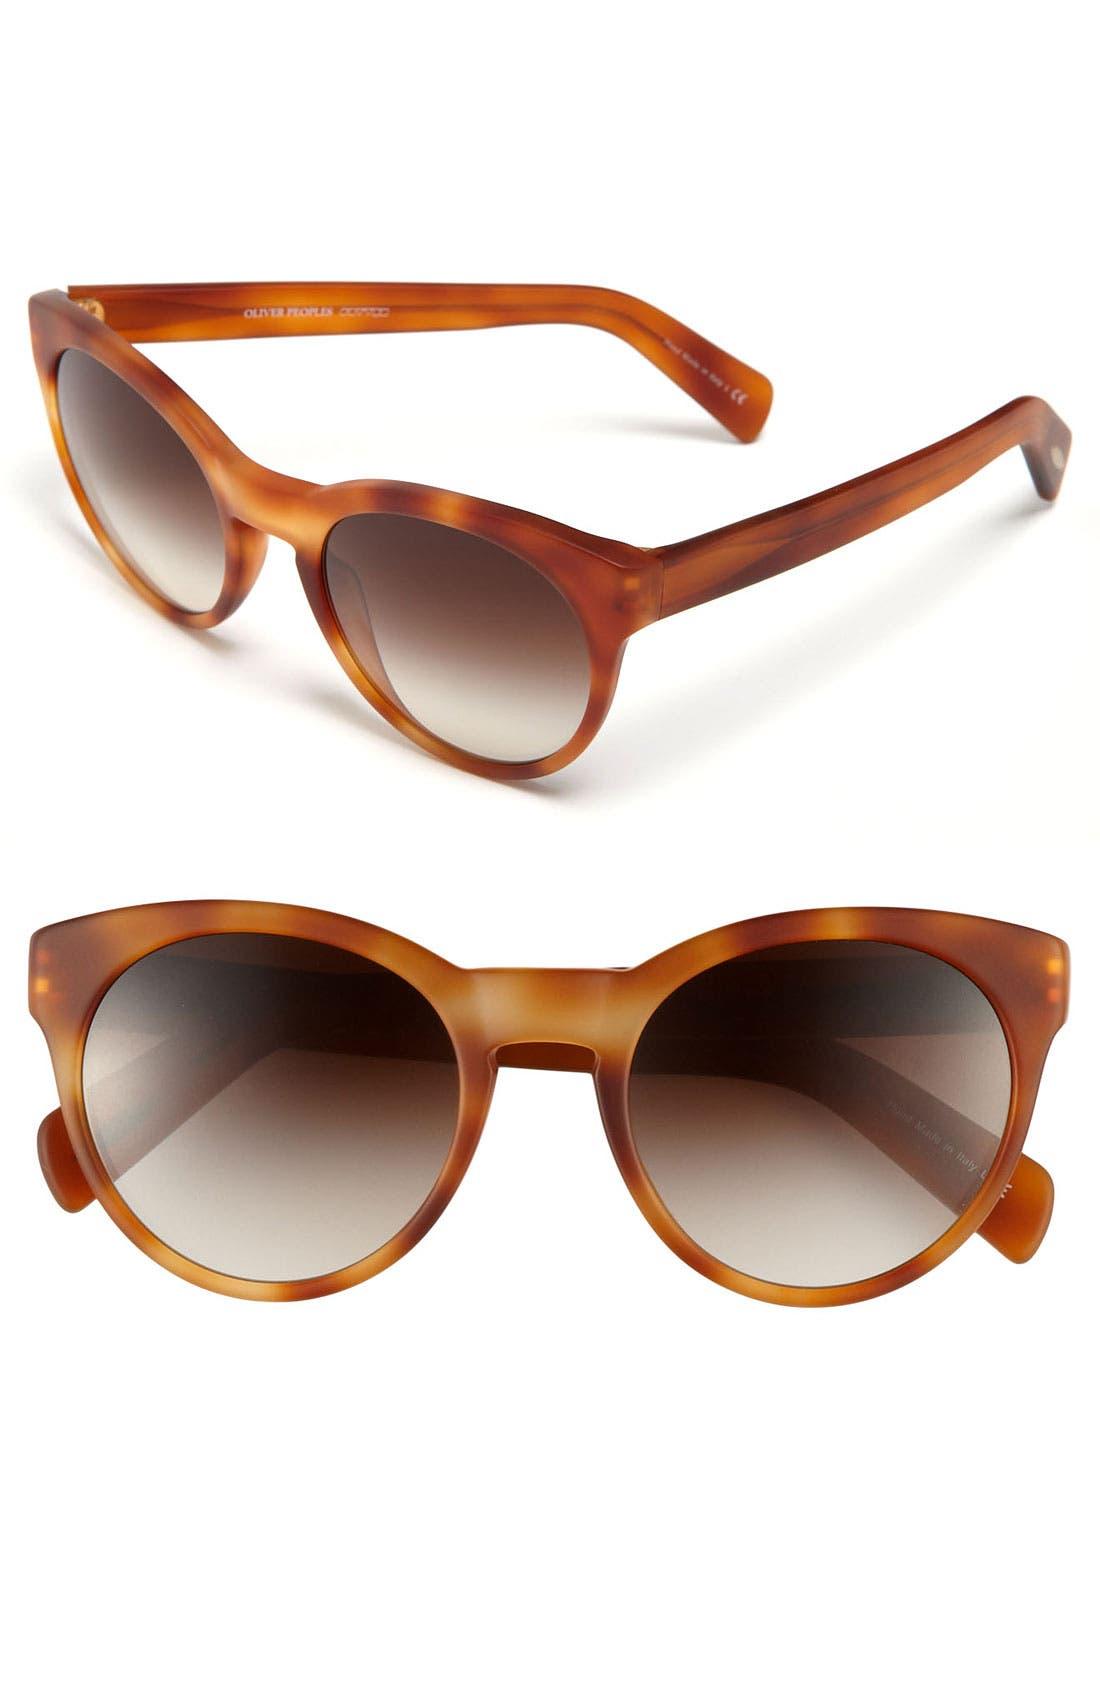 Alternate Image 1 Selected - Oliver Peoples 'Alivia' 52mm Sunglasses